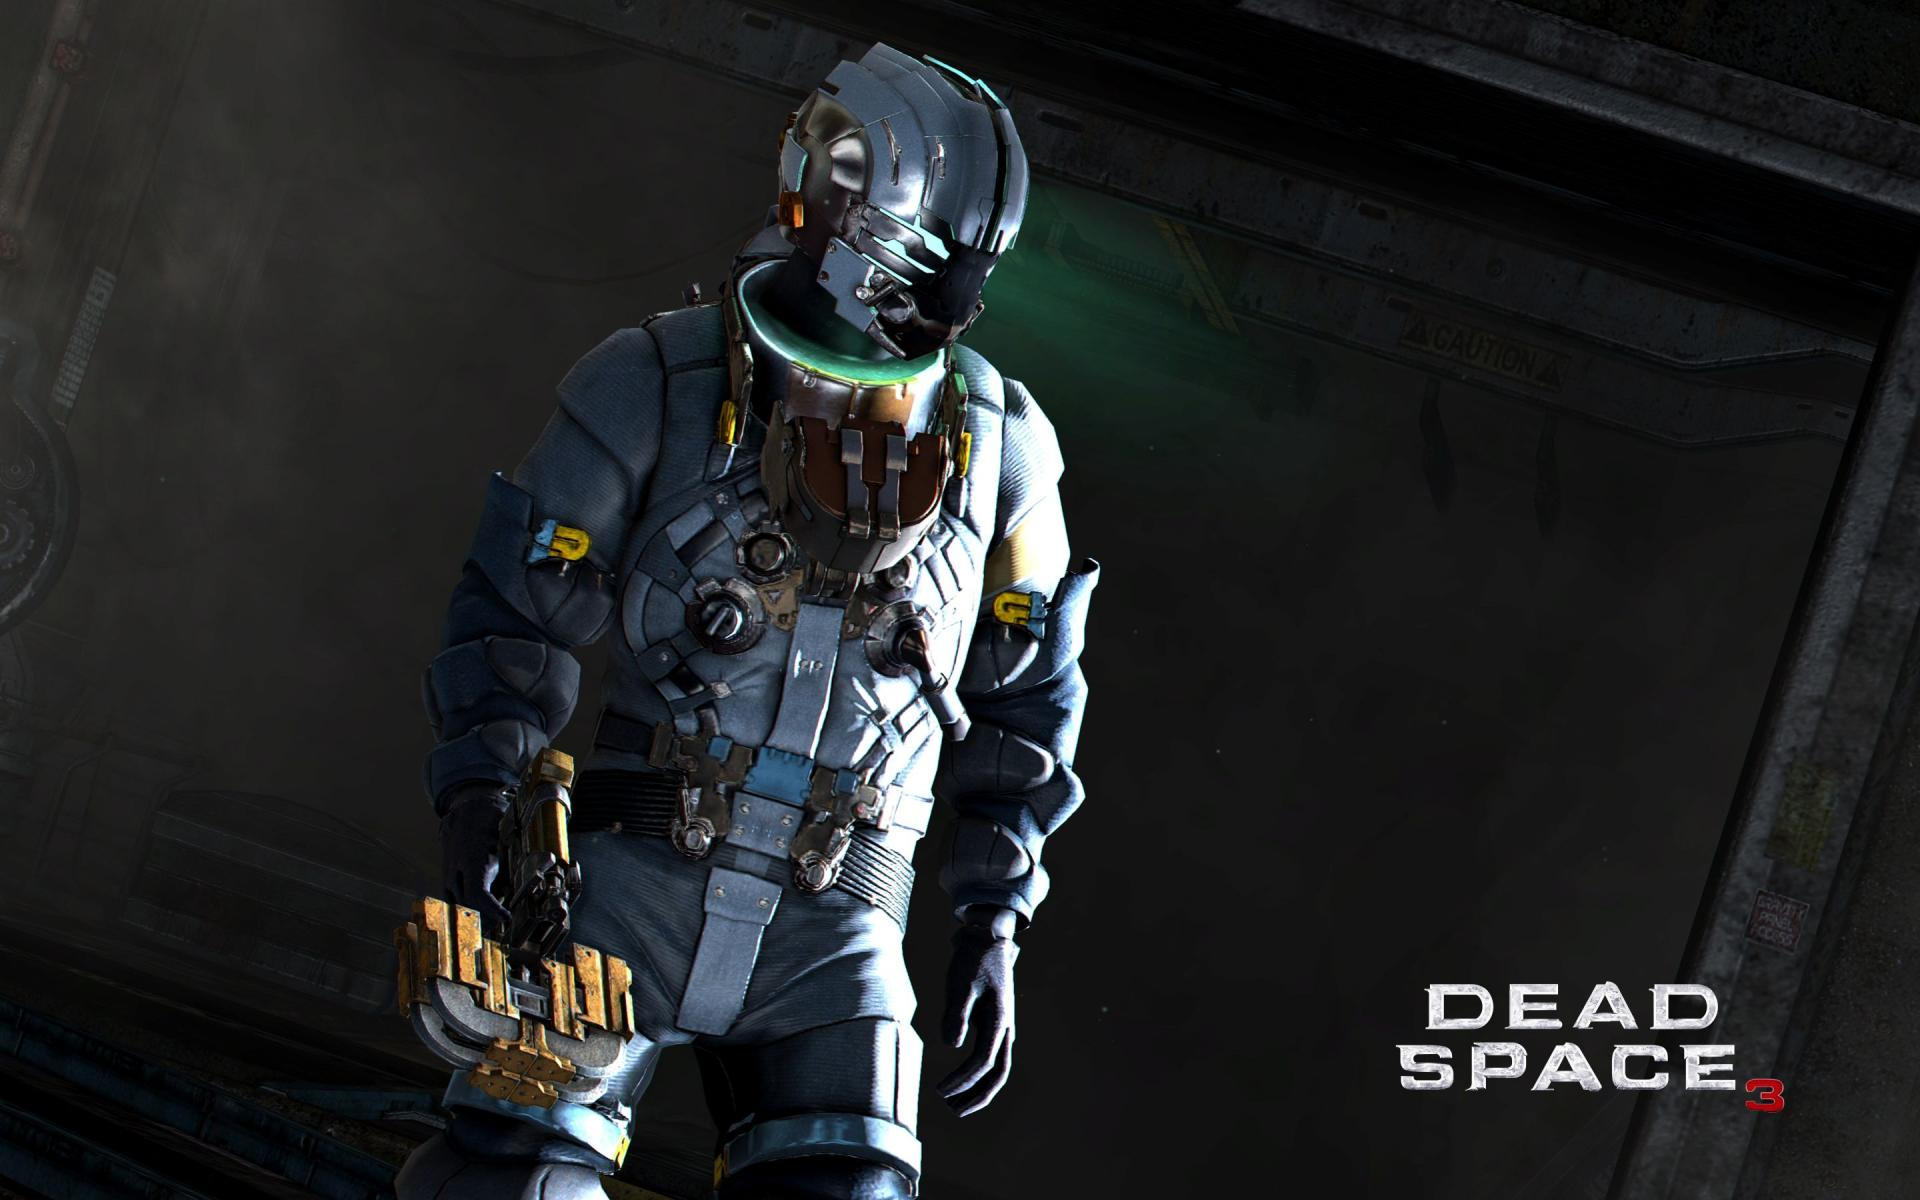 Dead space game wallpaper full hd desktop wallpapers 1080p - Dead space 2 wallpaper 1080p ...